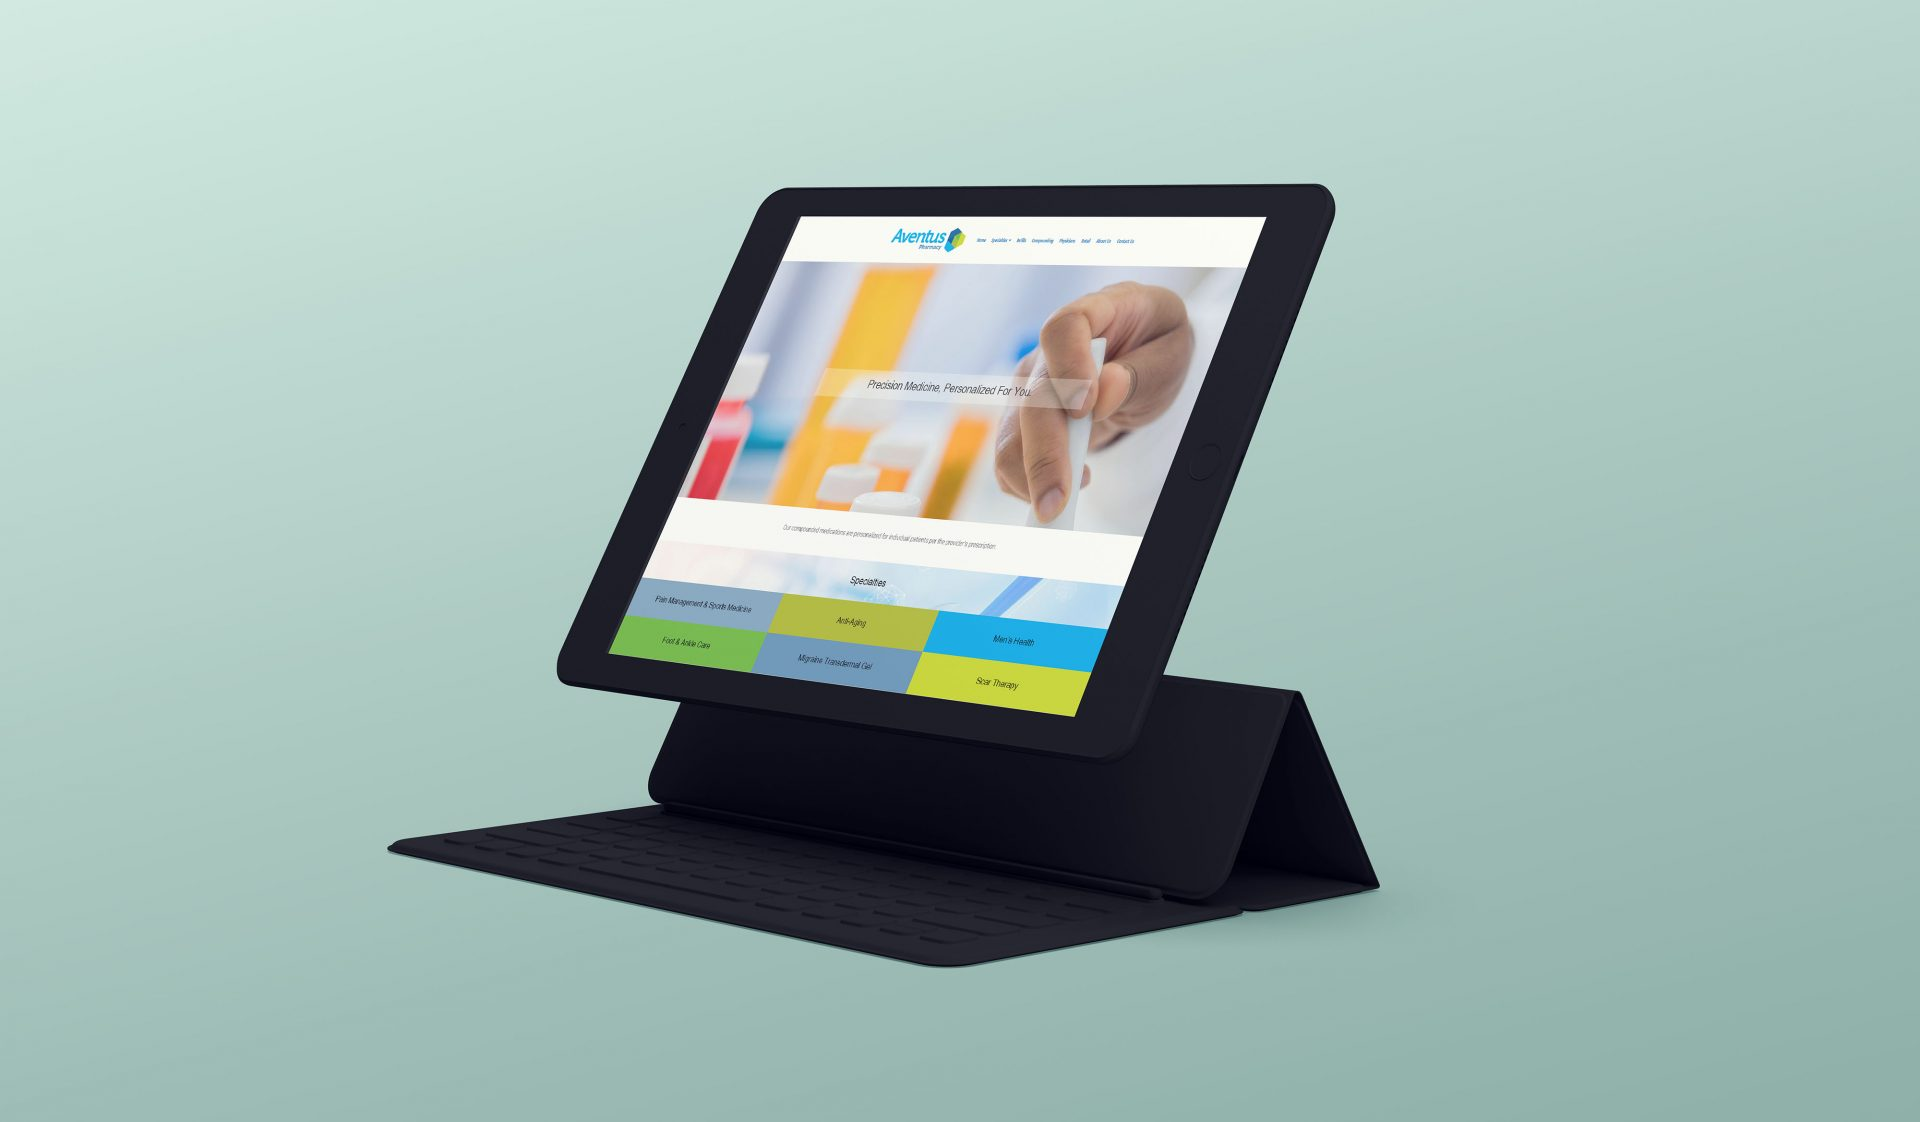 Ipad website design for a pharmacy